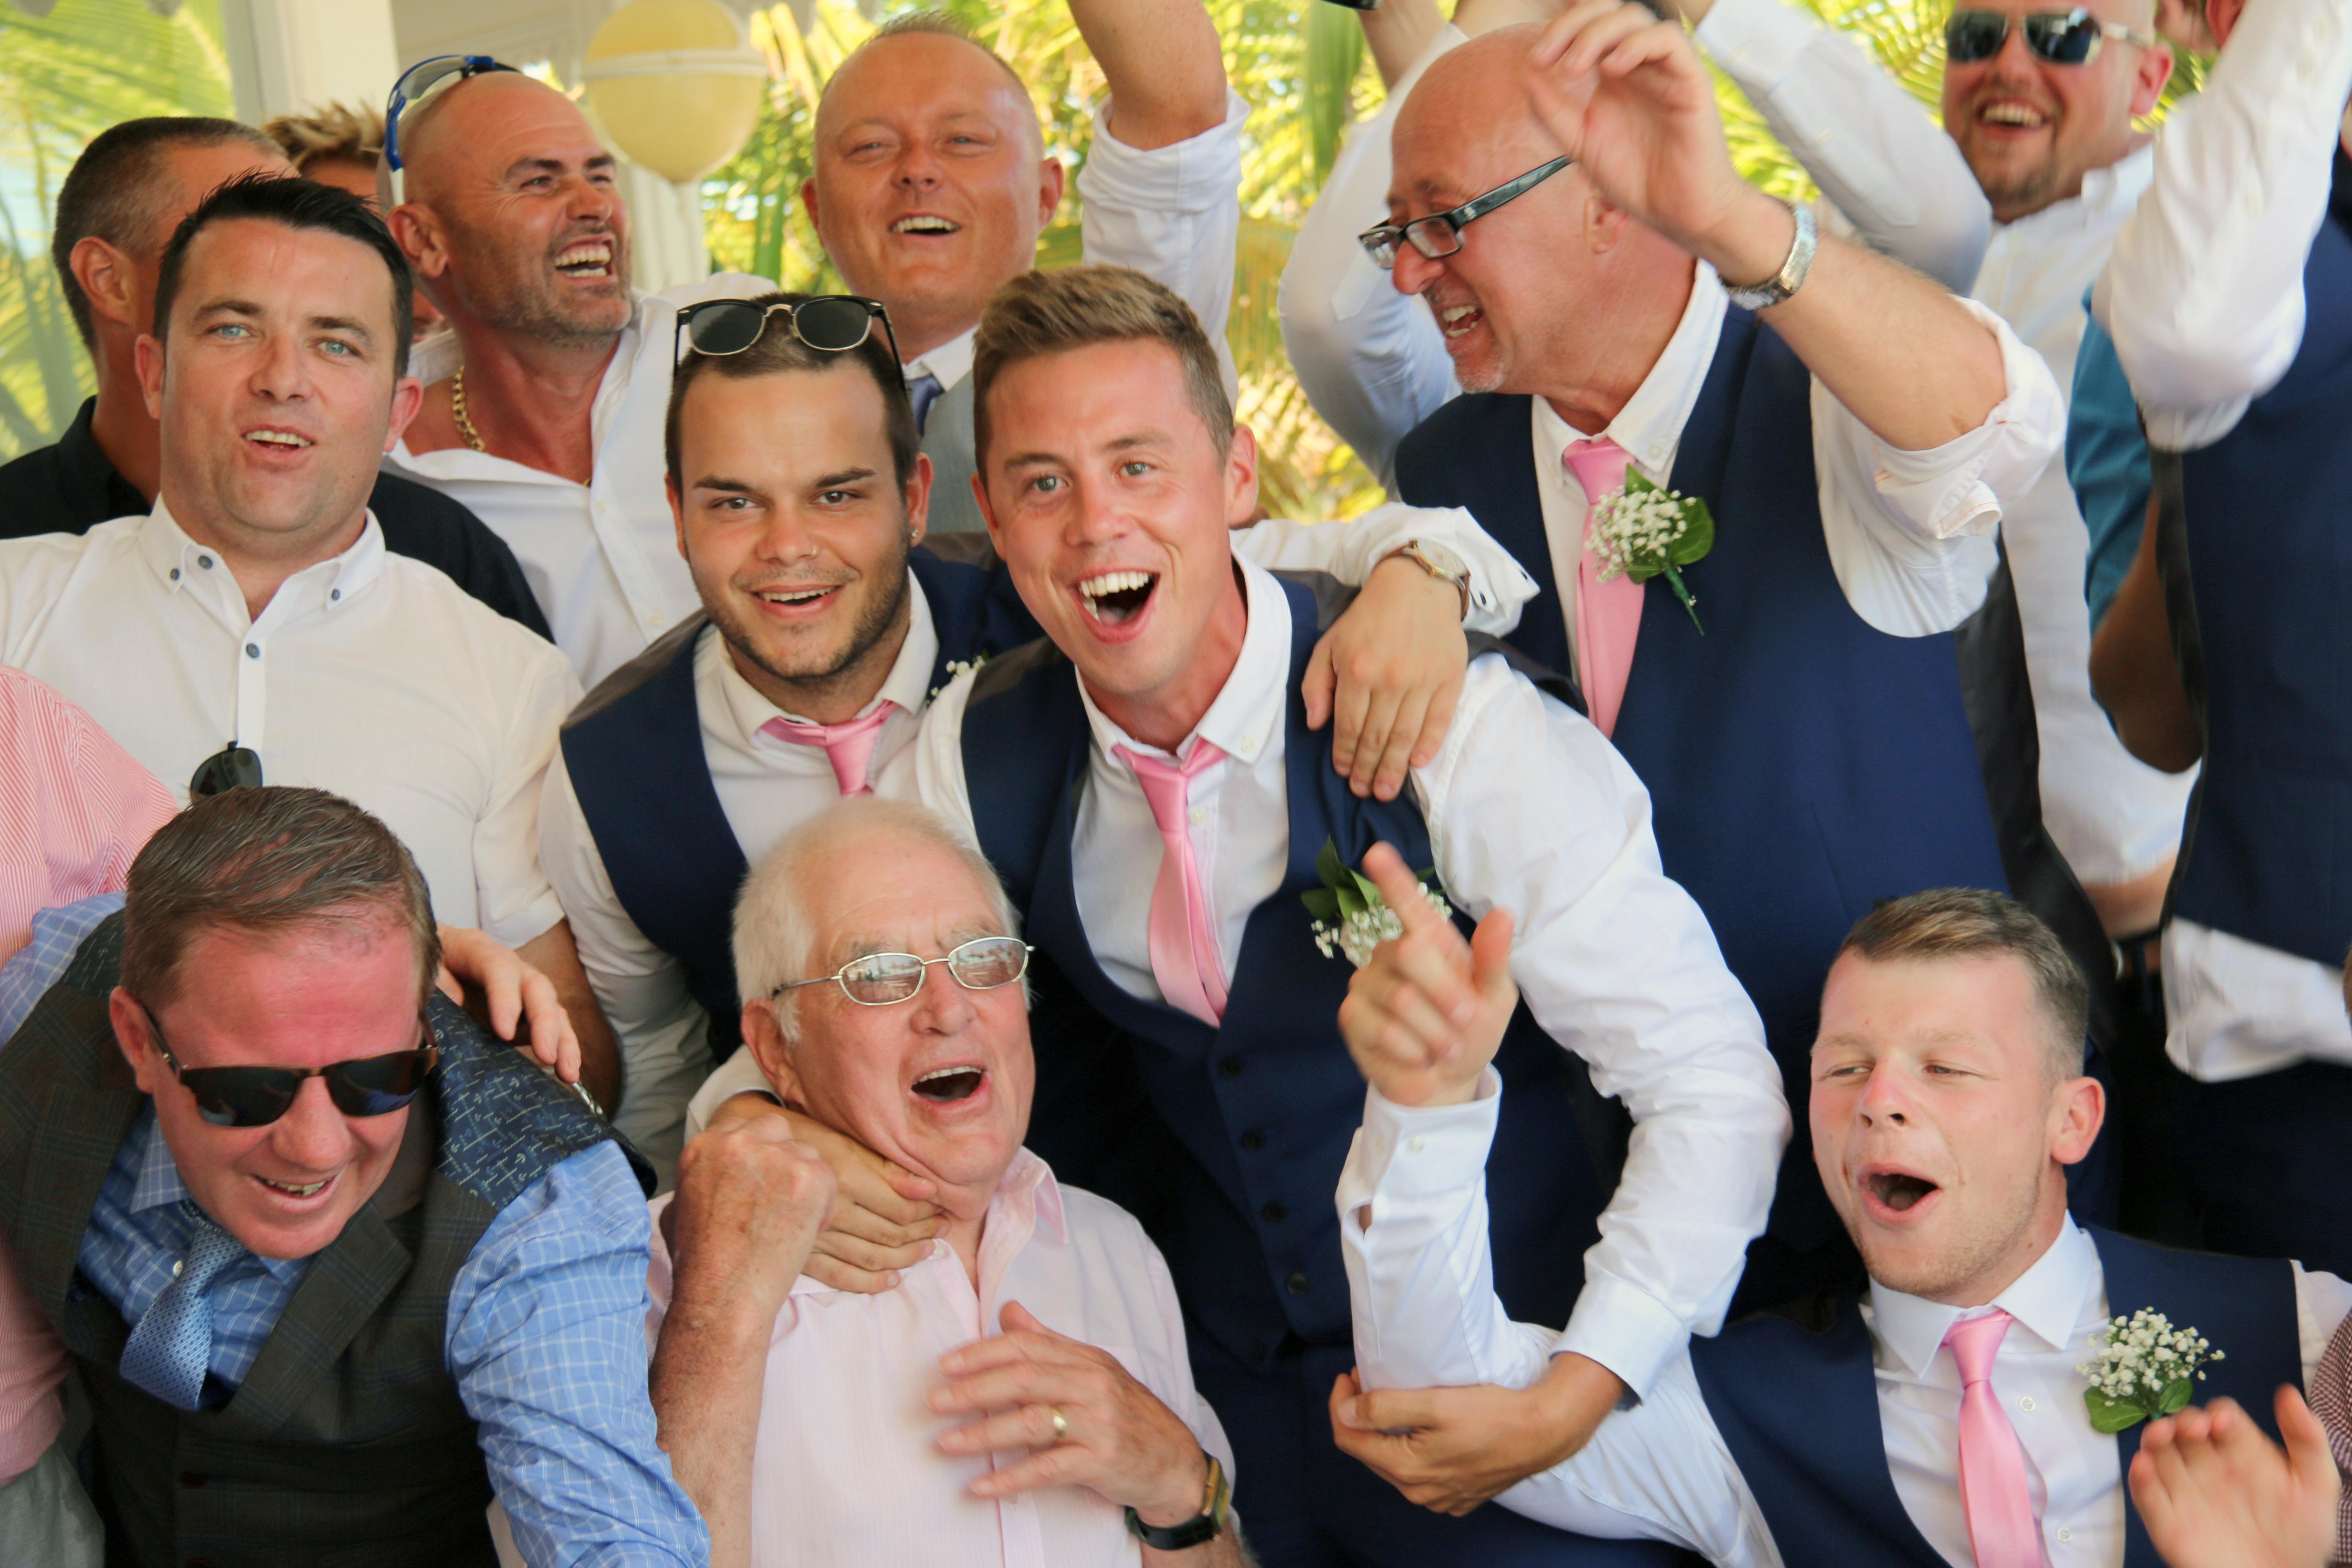 More lads